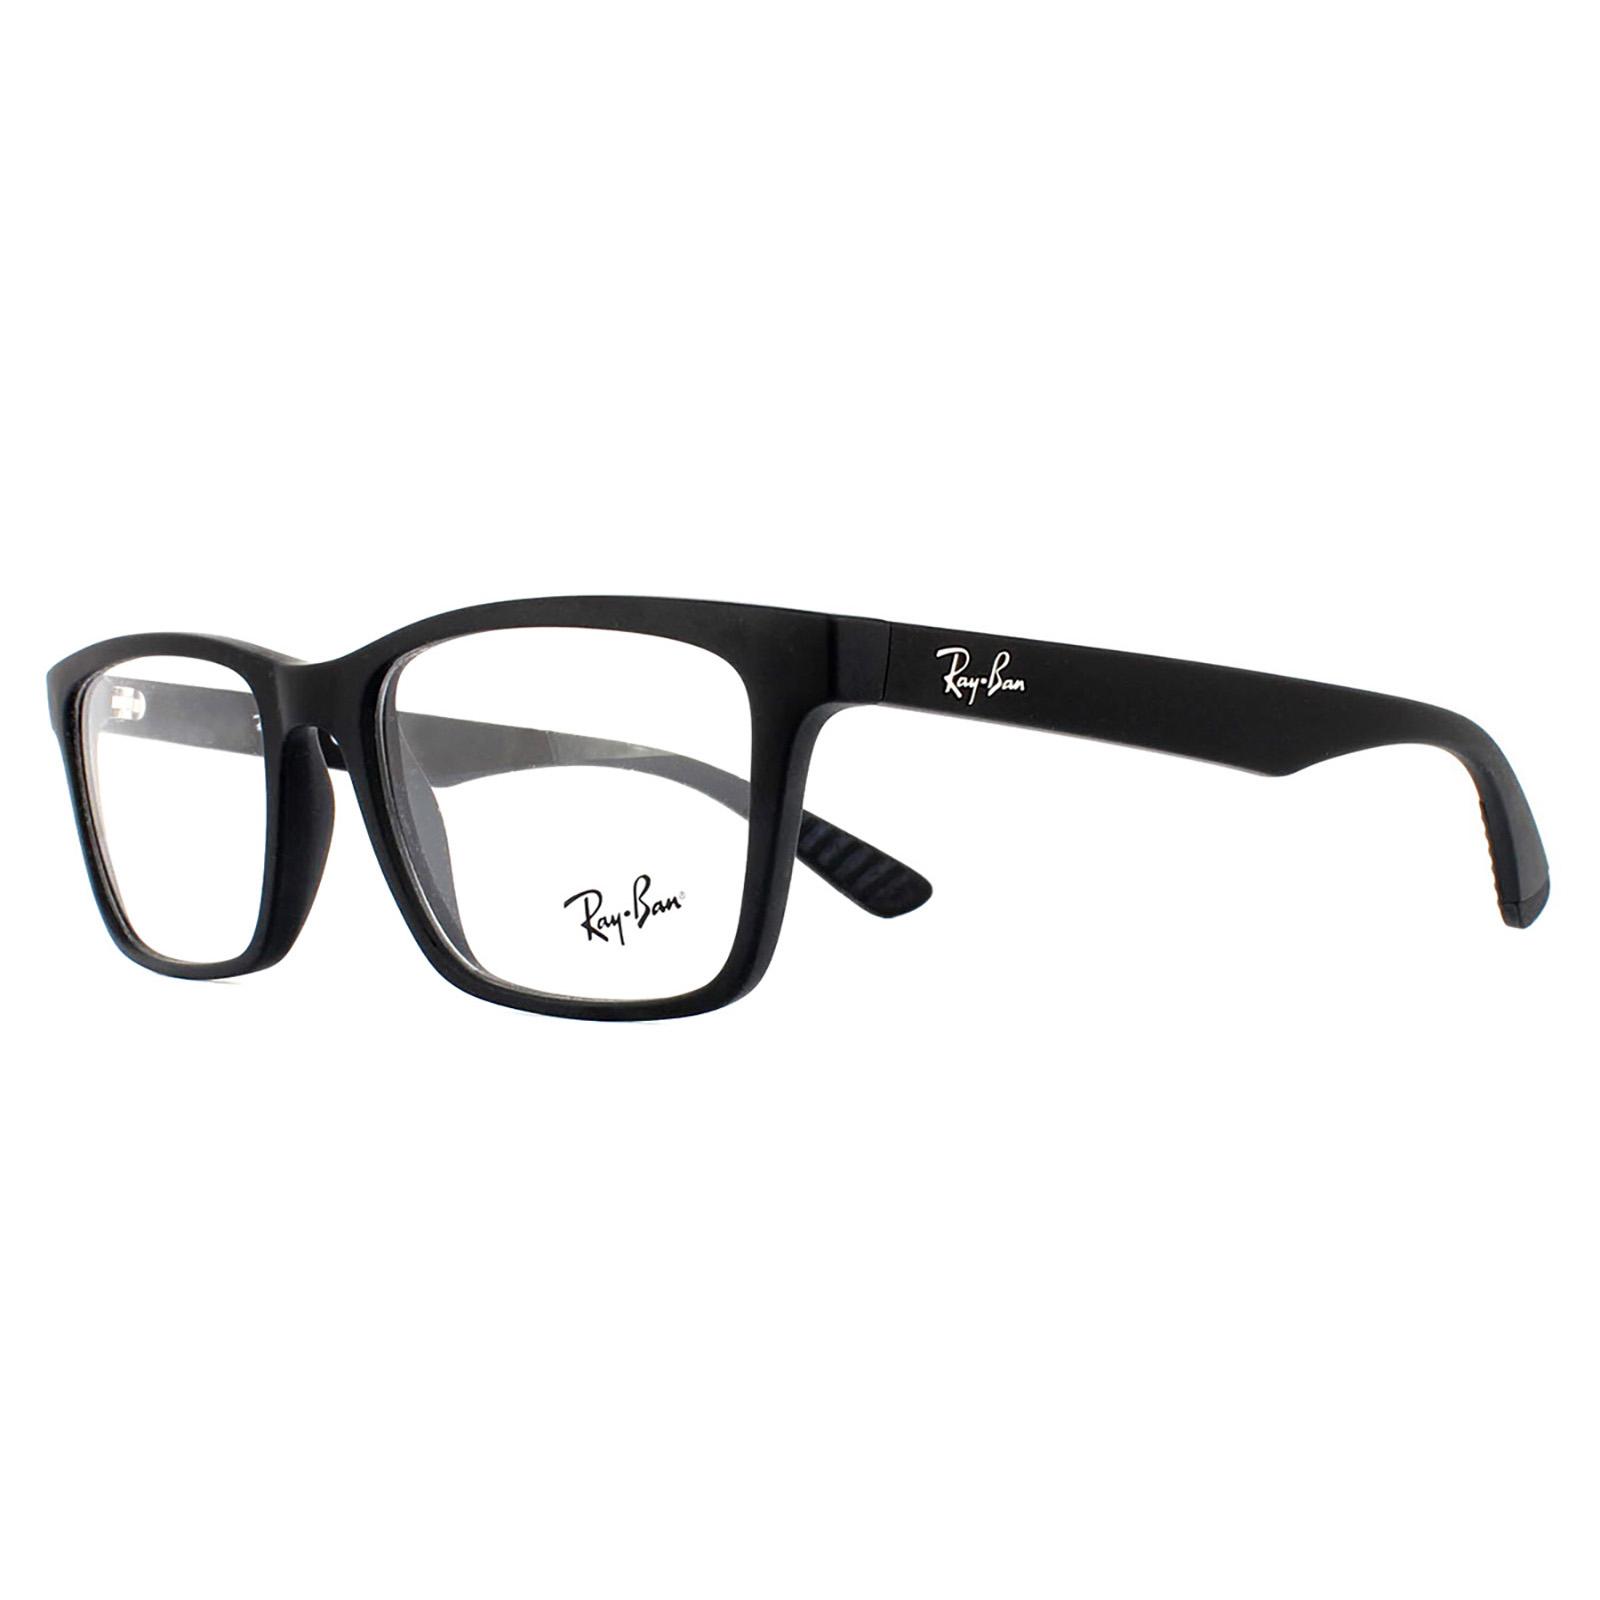 86a0087ffcfcf Sentinel Ray-Ban Glasses Frames 7025 2077 Matte Black Men 53mm